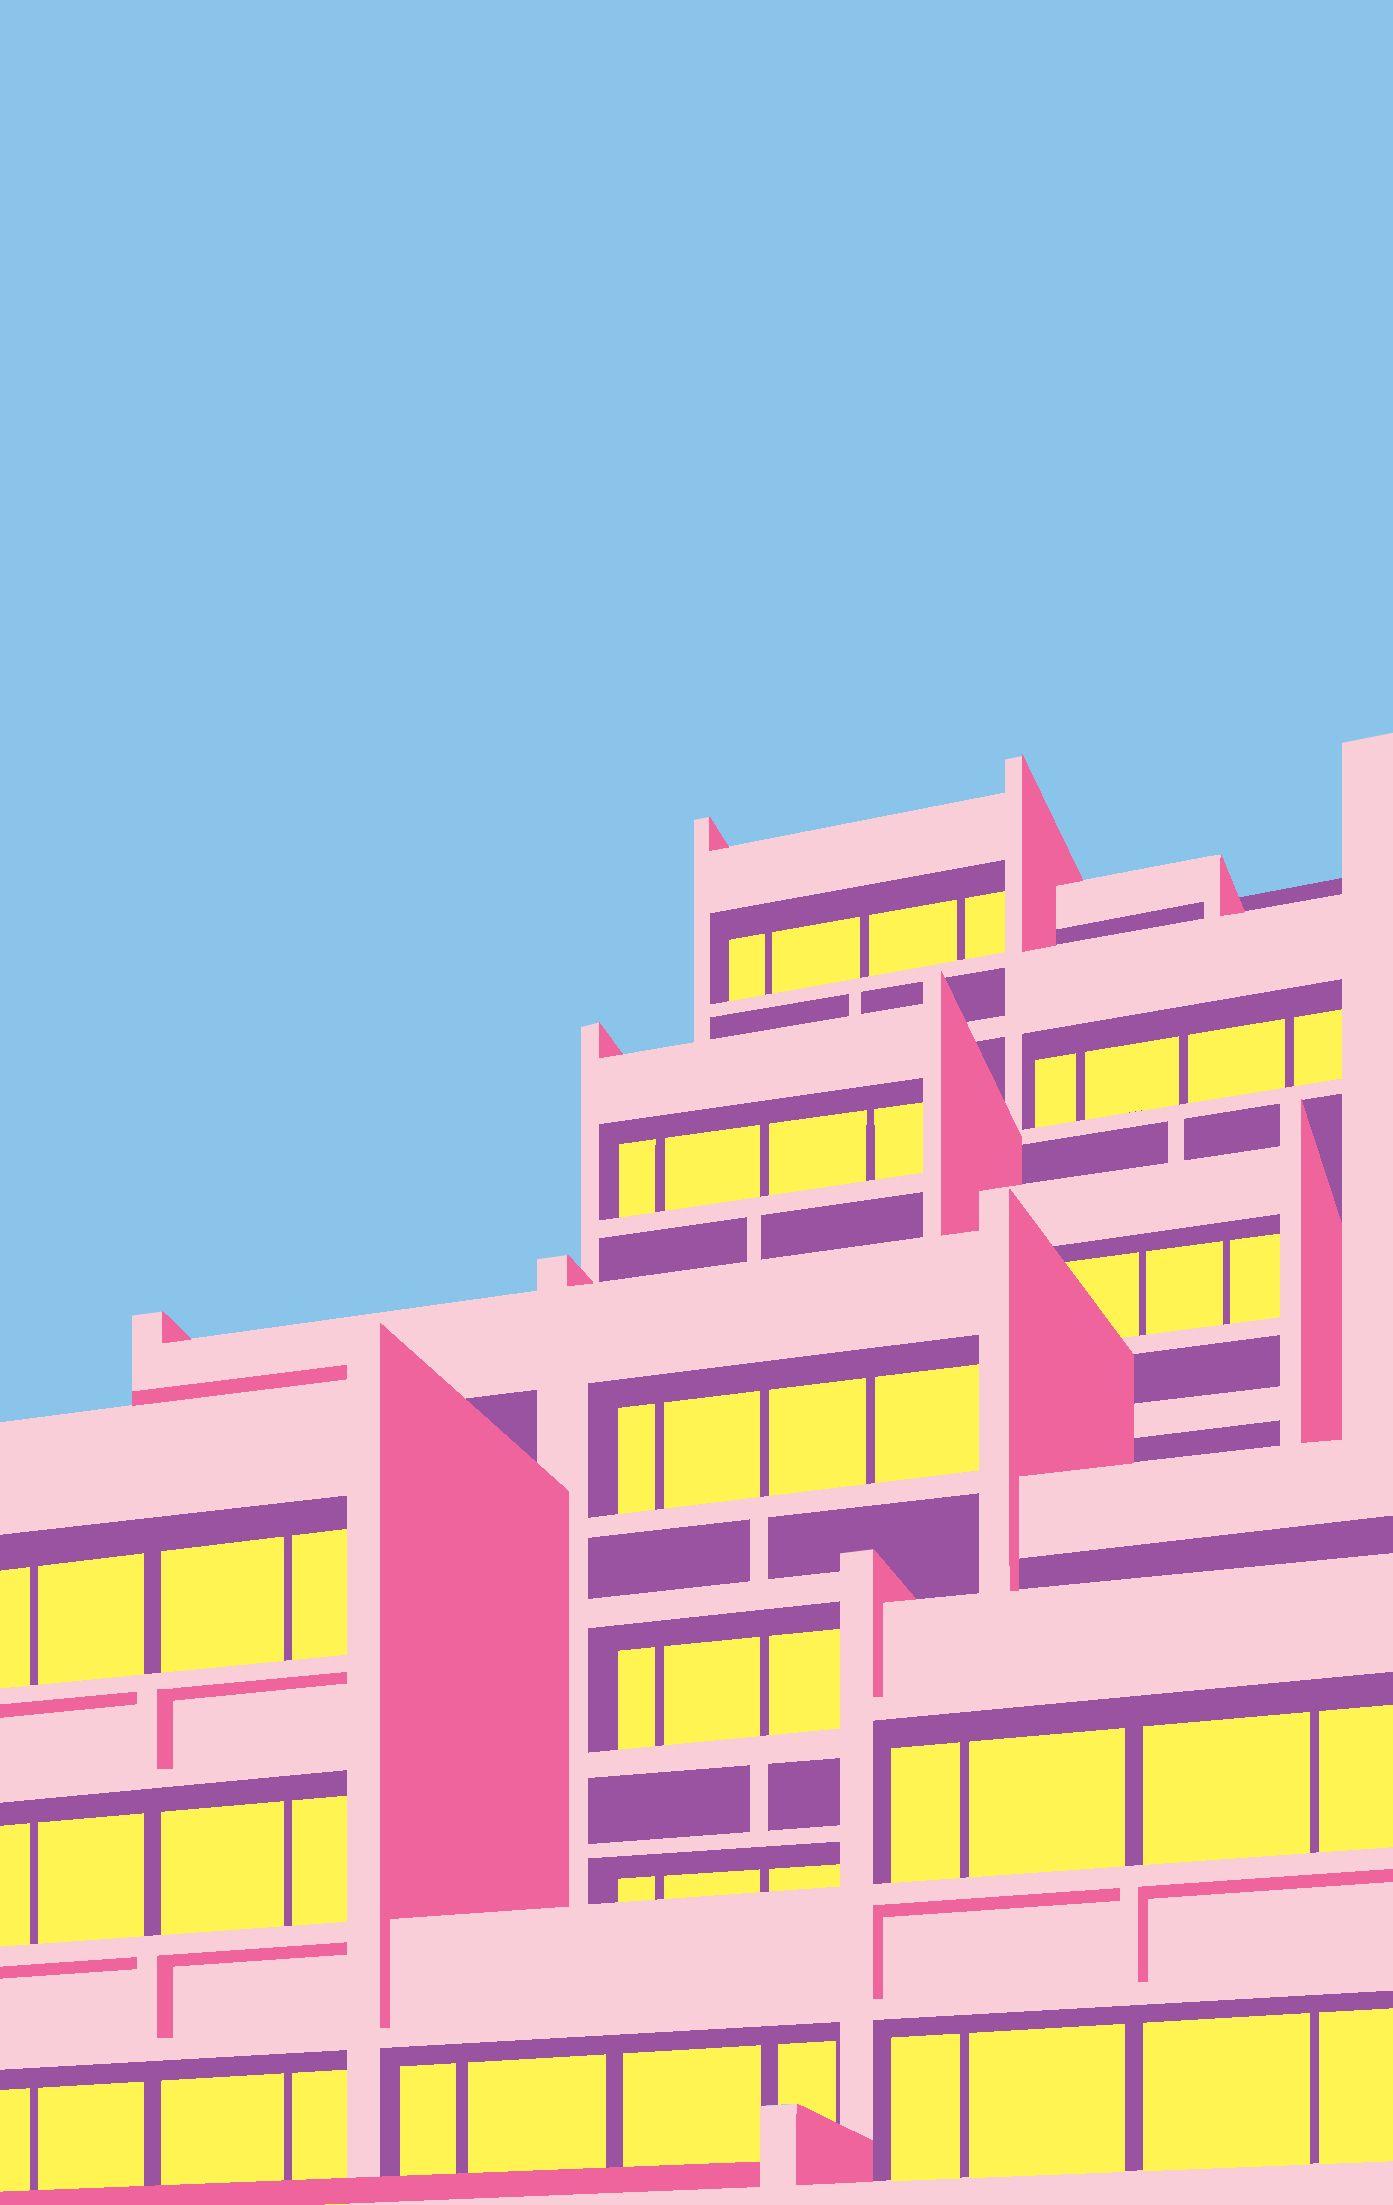 Picture Book Illustration Making An Architectural Model: Pin De Rebecca Chau En Mastermind Inspiration En 2019